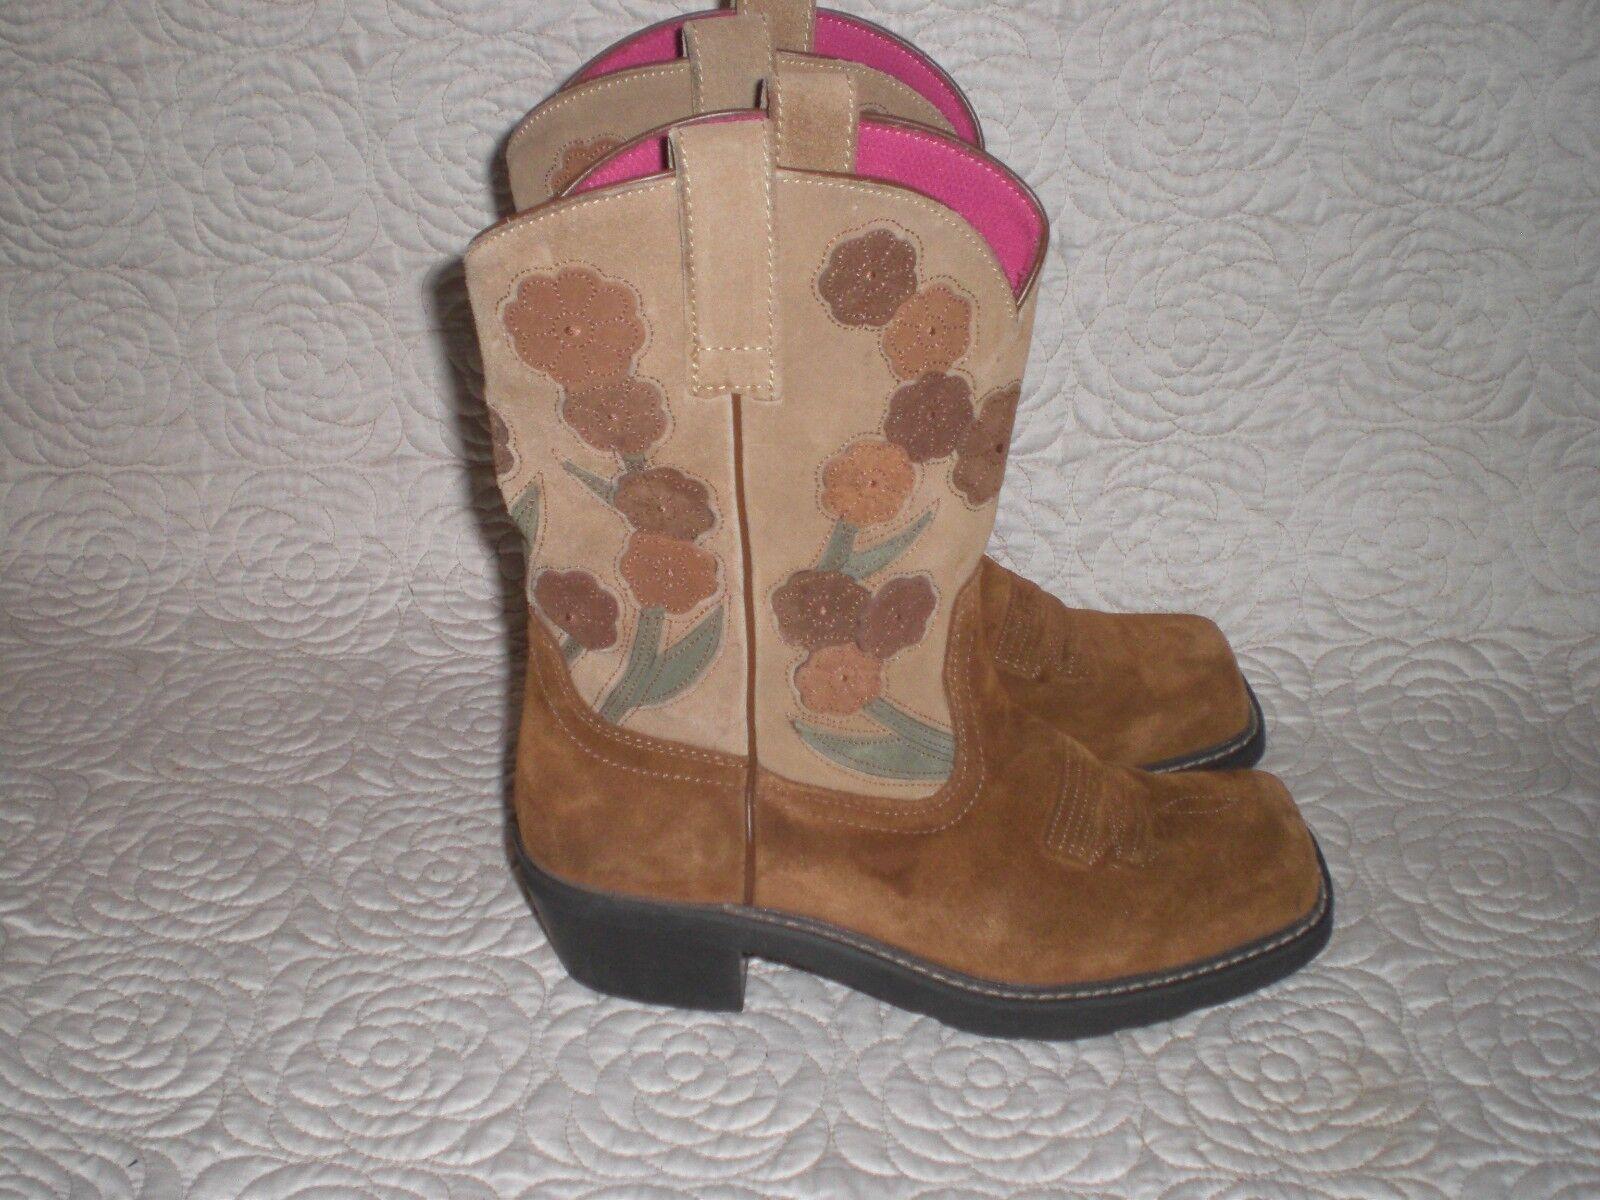 Damenschuhe ARIAT Doll Baby 16230 Suede Leder Square Toe Floral Cowboy Stiefel 9.5 B